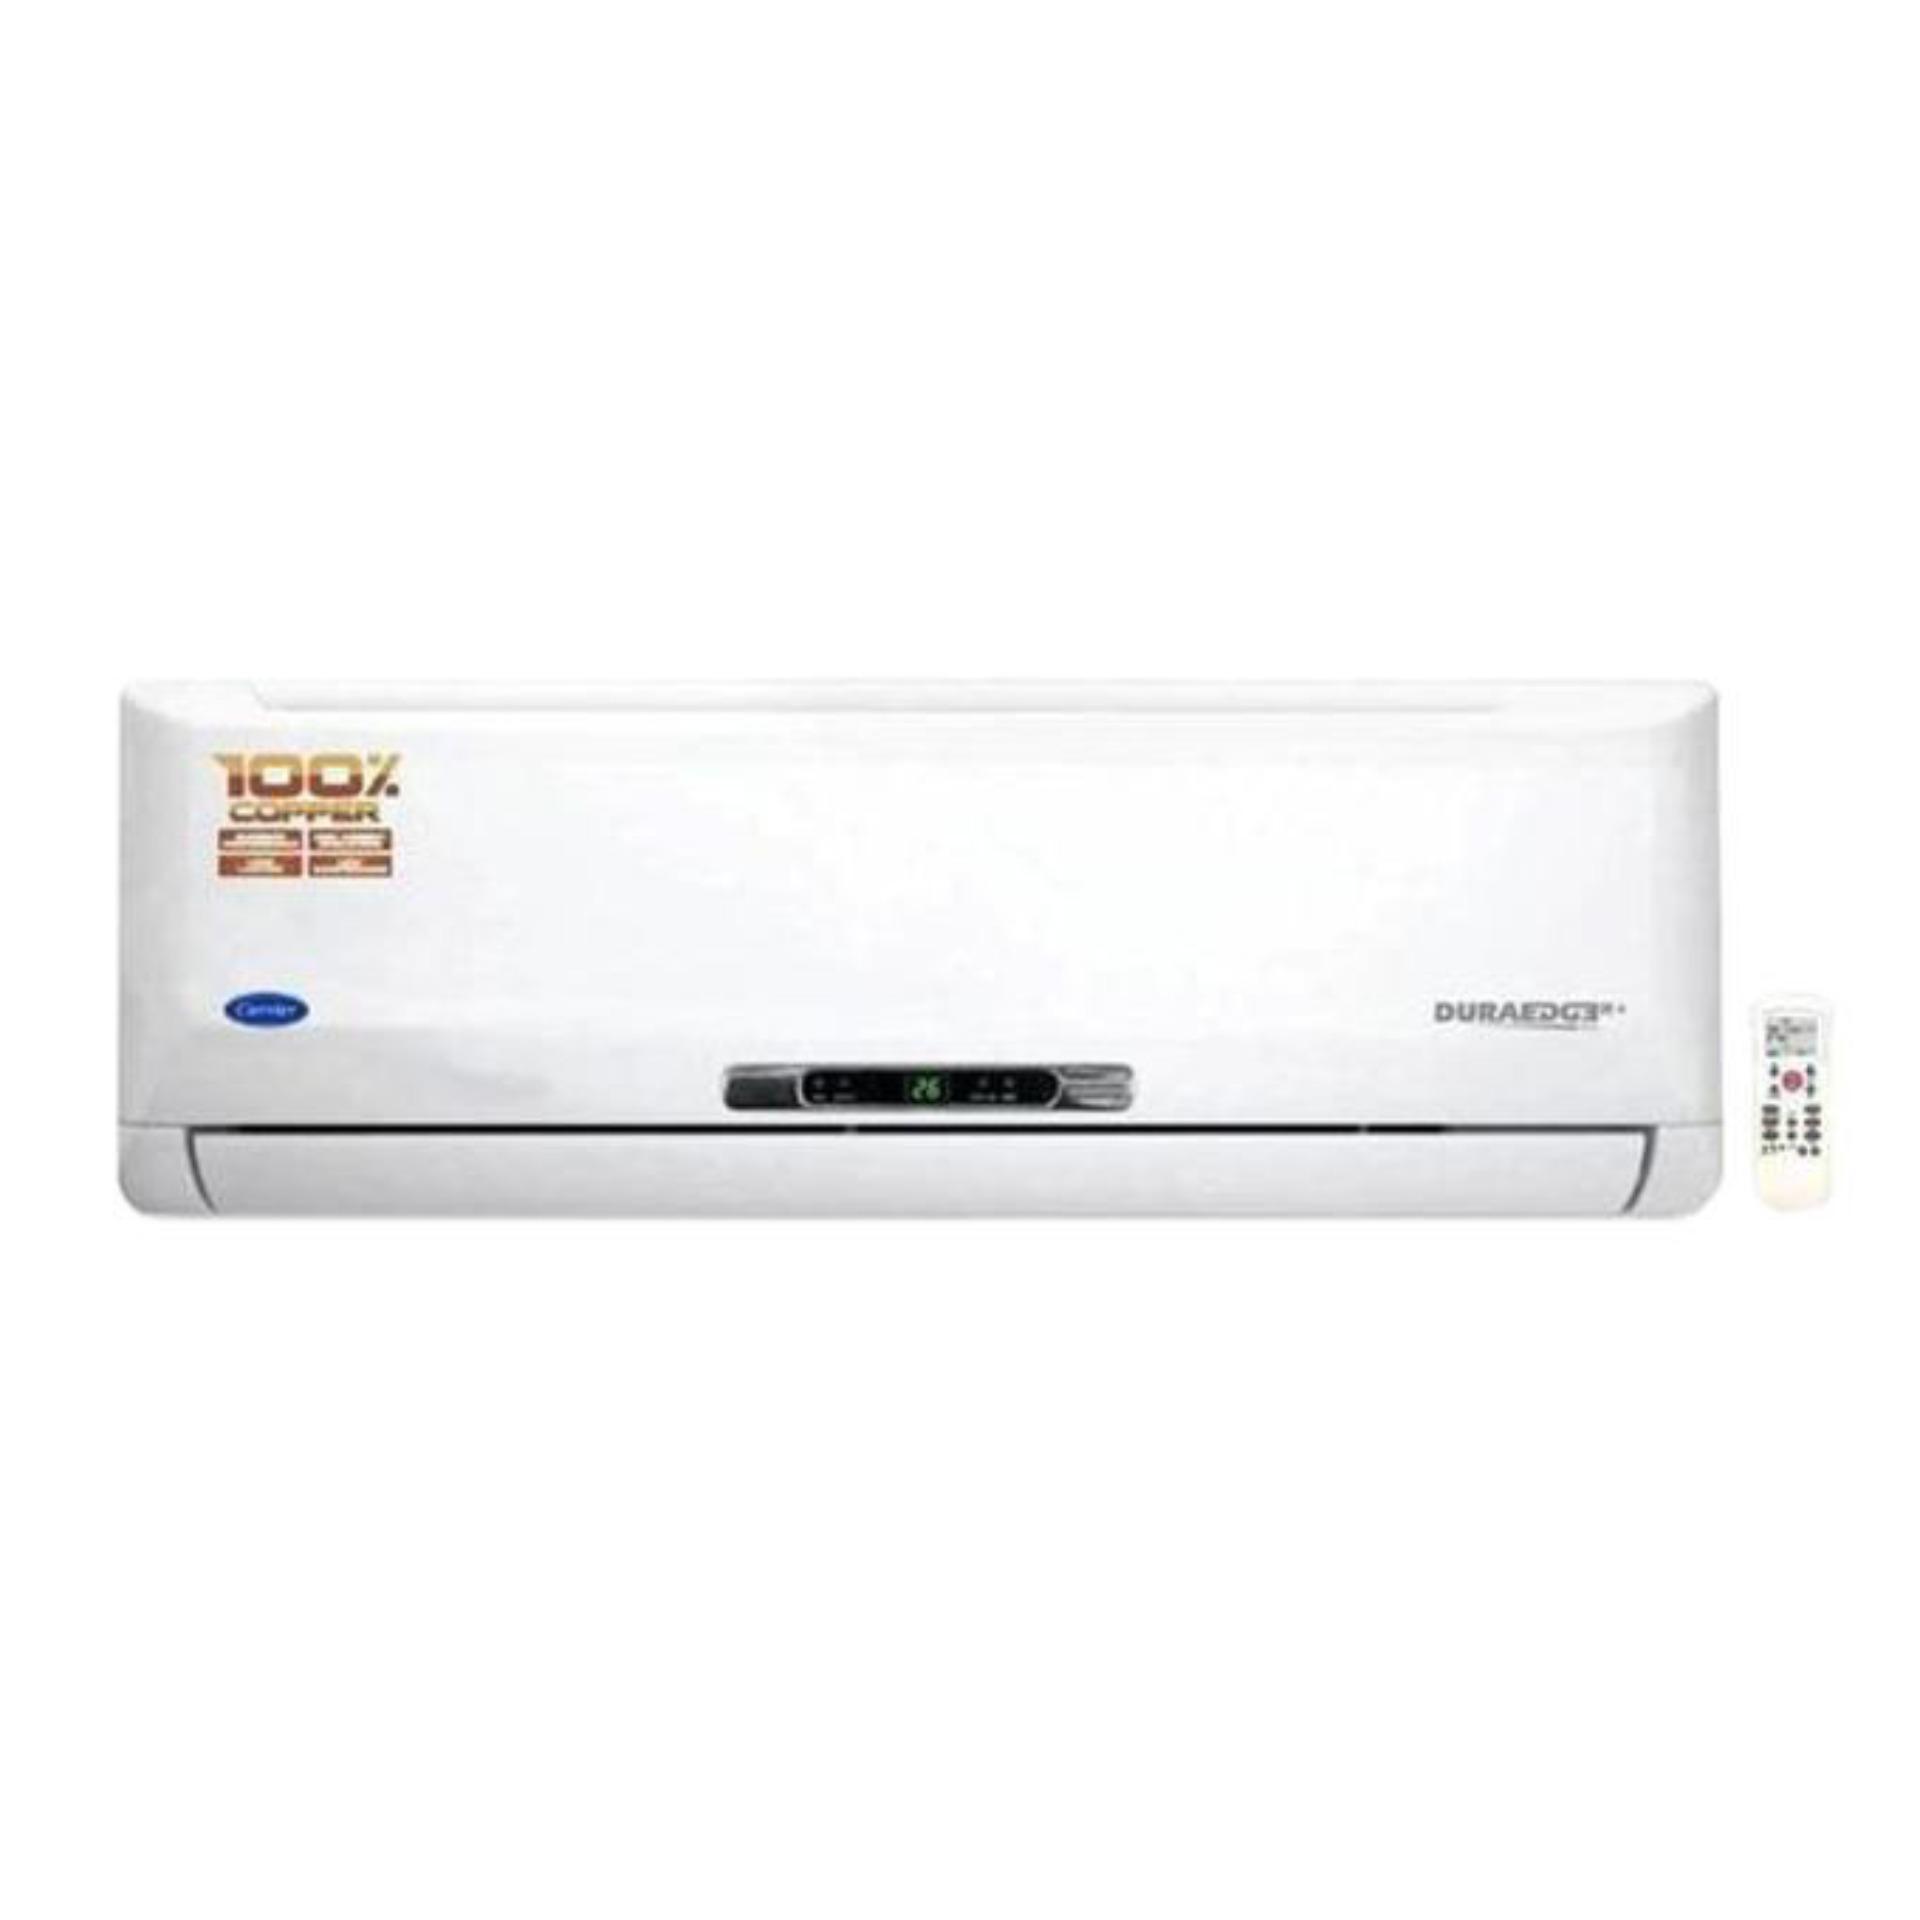 42khao18n split ac 2ton white - Carrier Air Conditioner